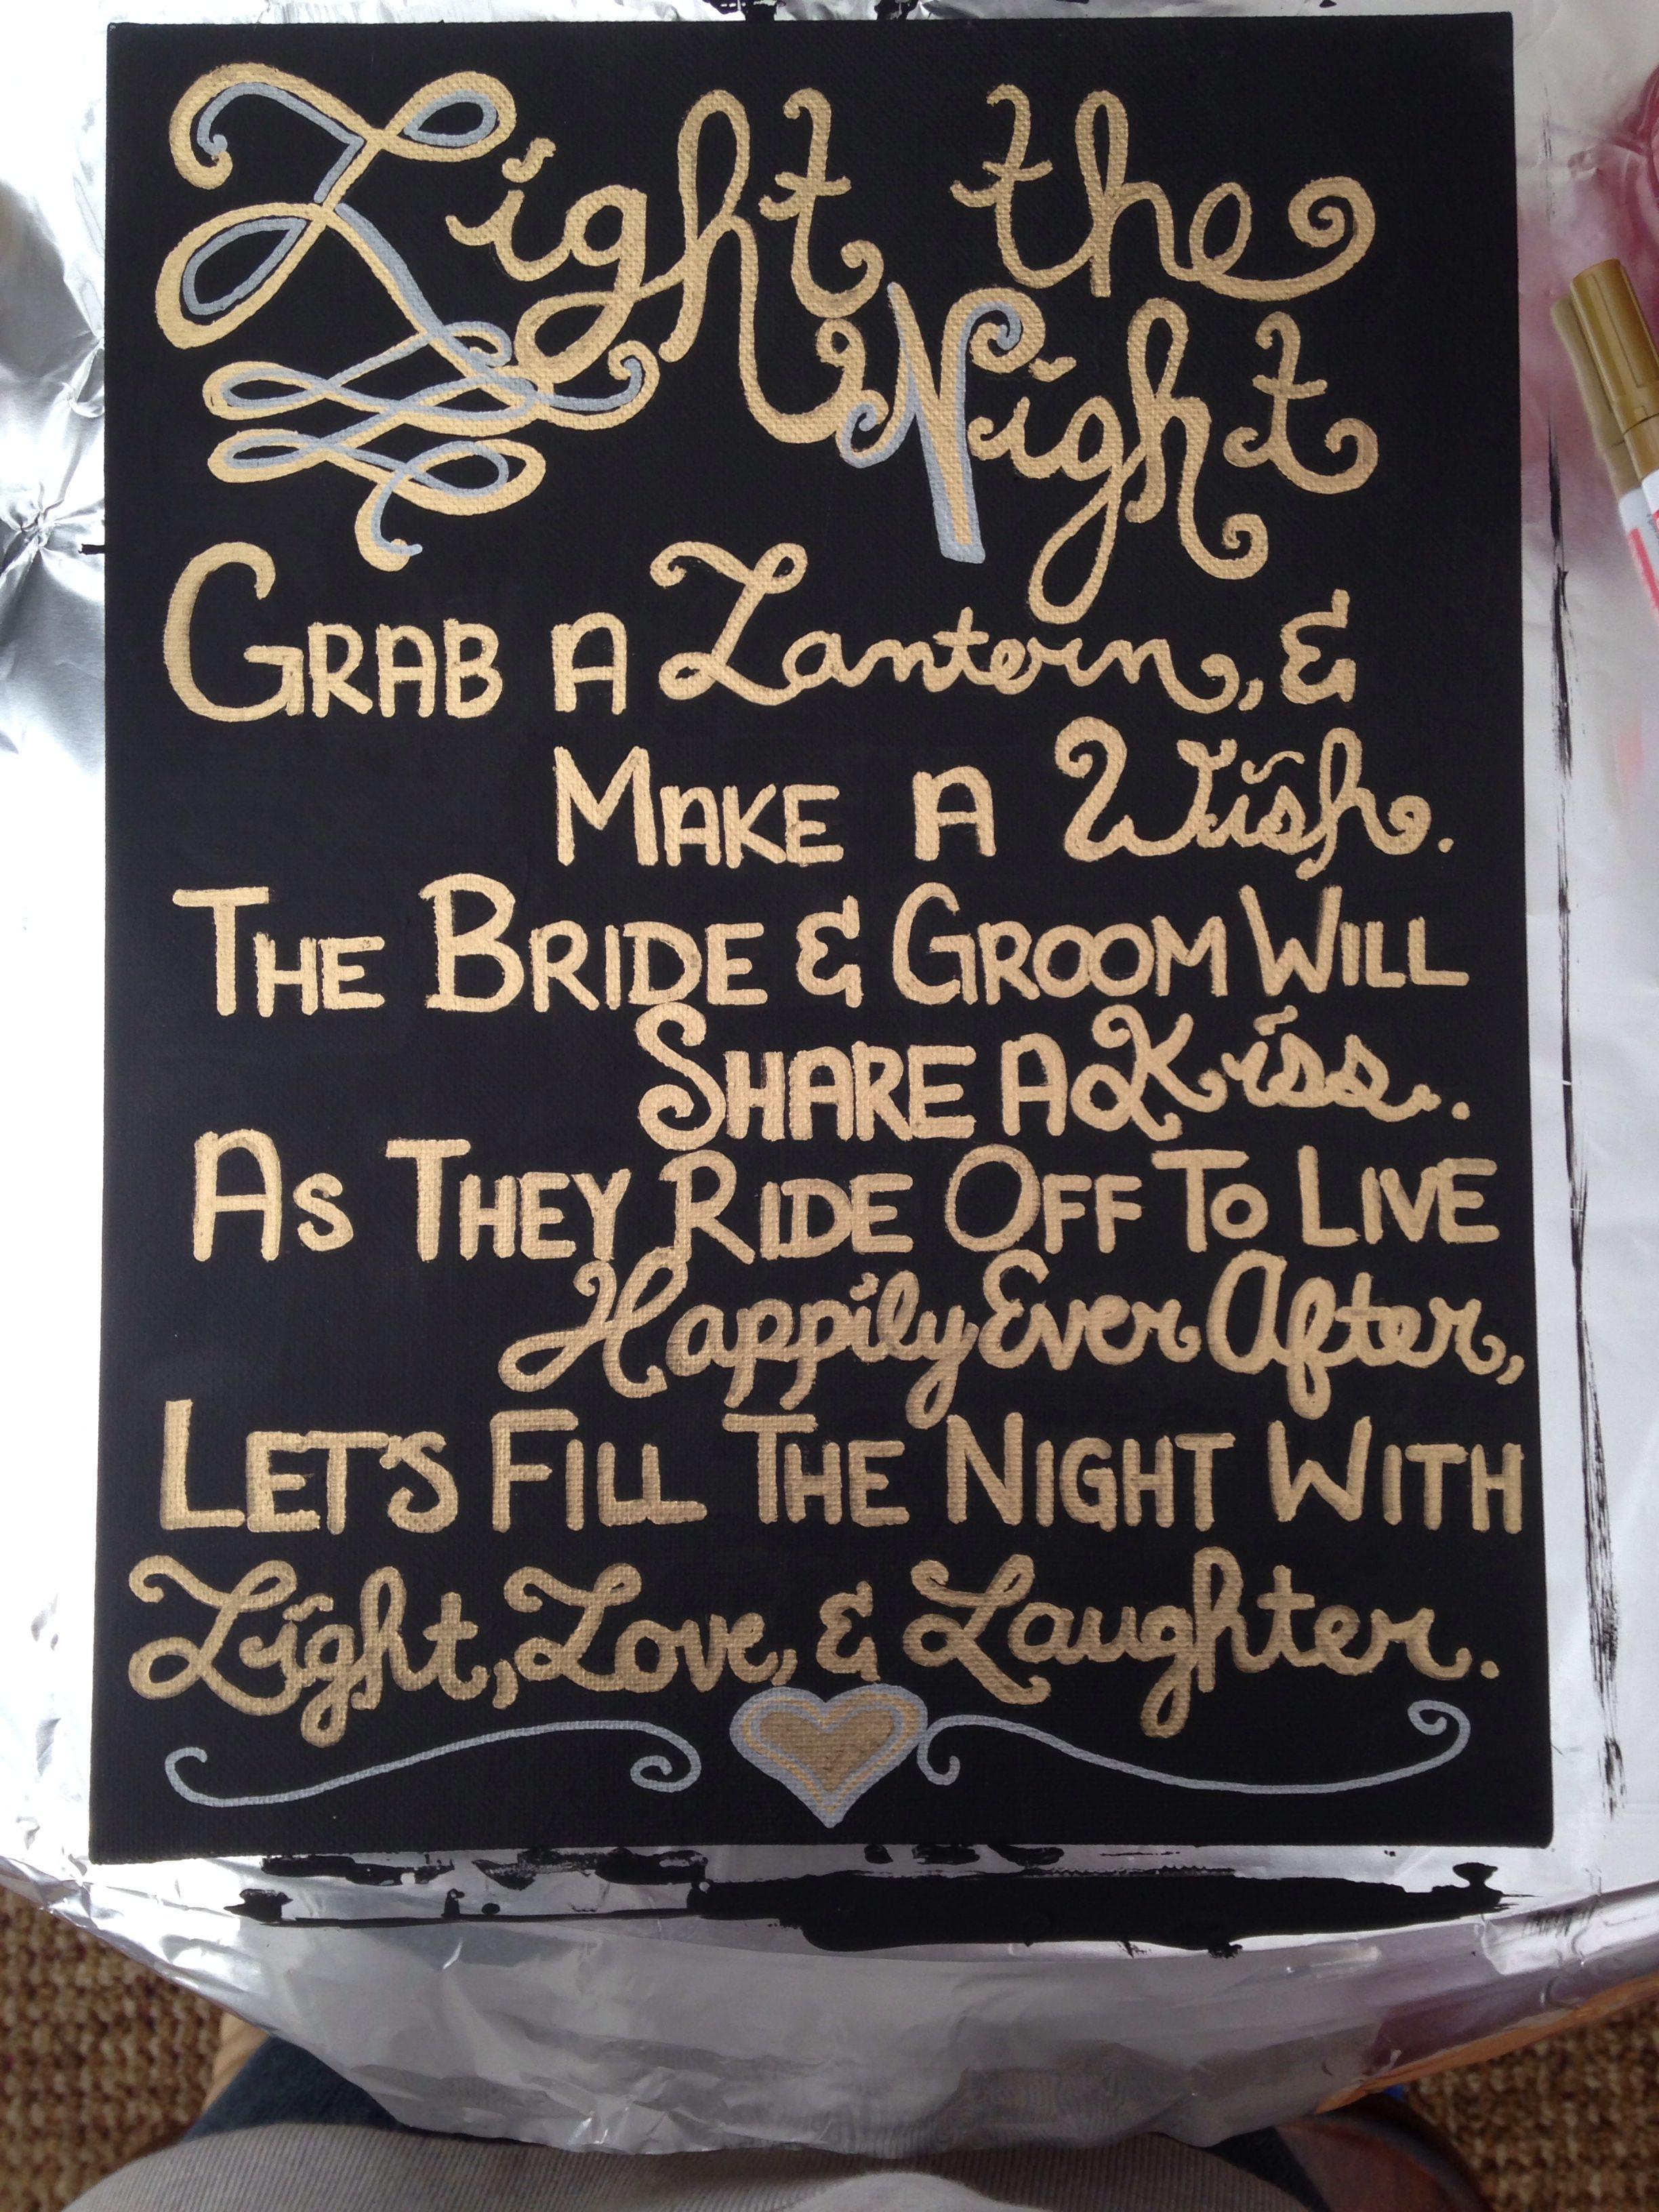 Wedding decorations tulle and lights  Latest wedding creation  lantern release poem wedding lanterns